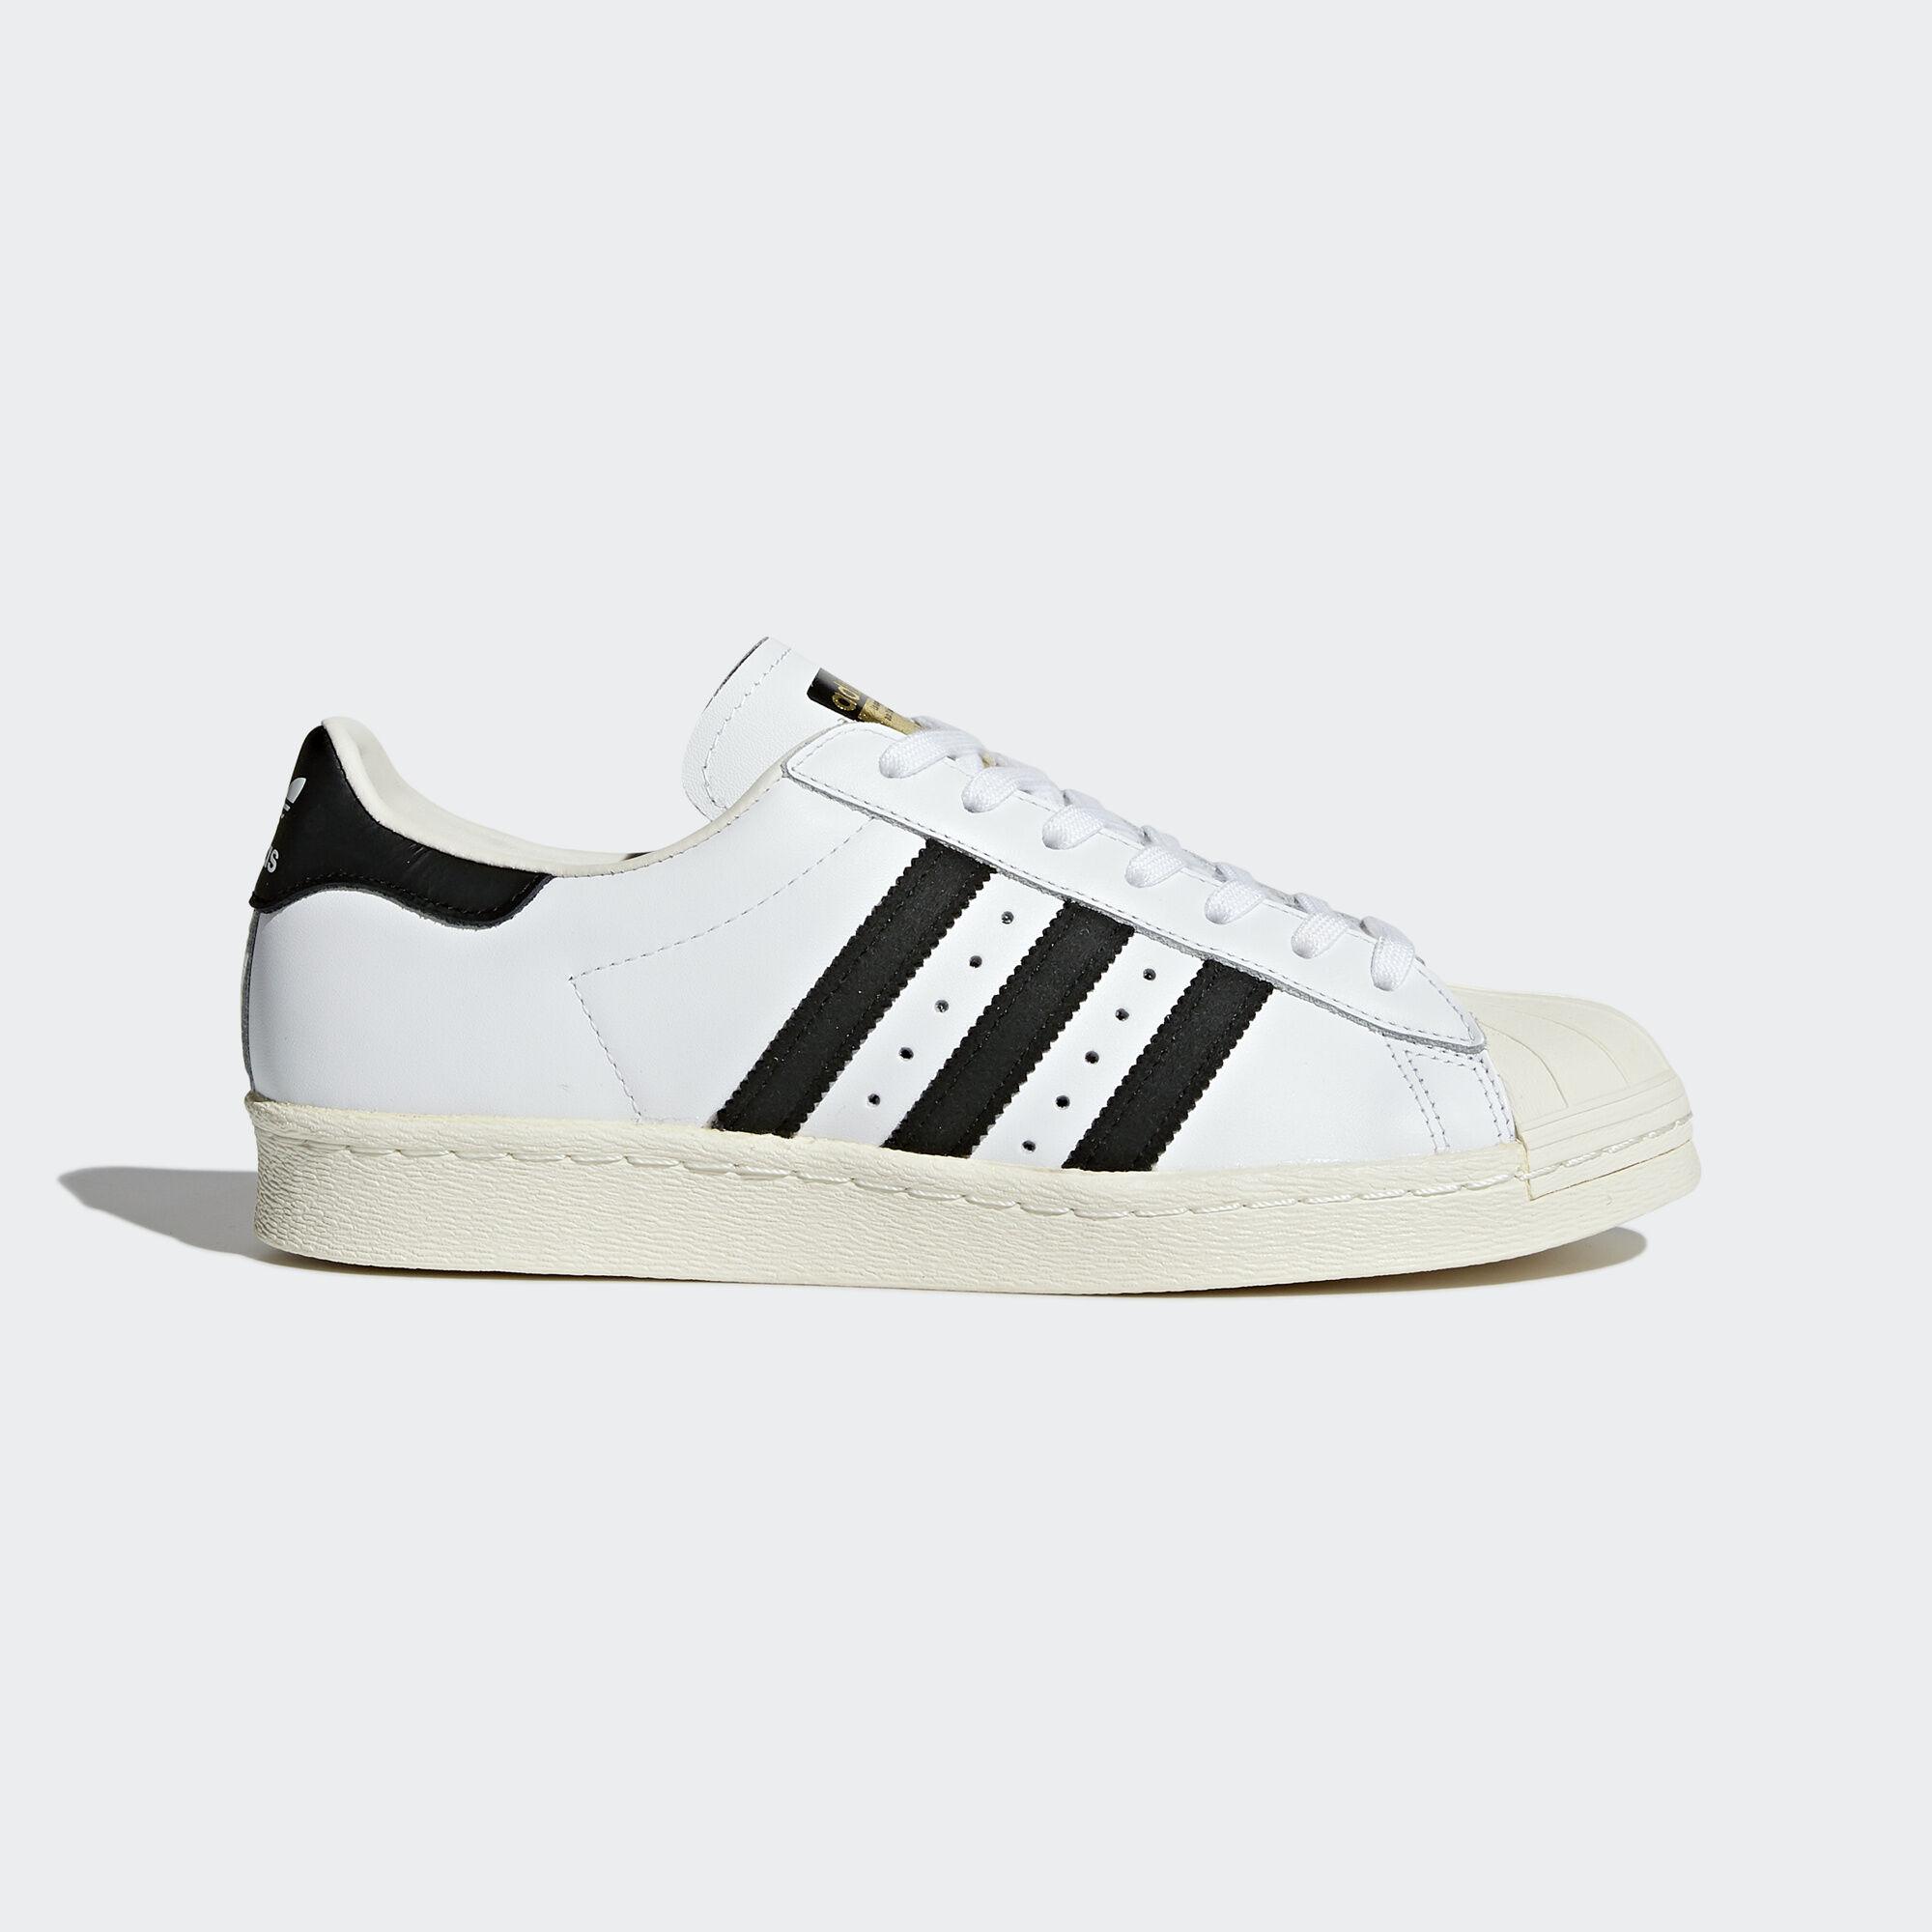 Adidas Schuhe Damen Weiß Grün o ton